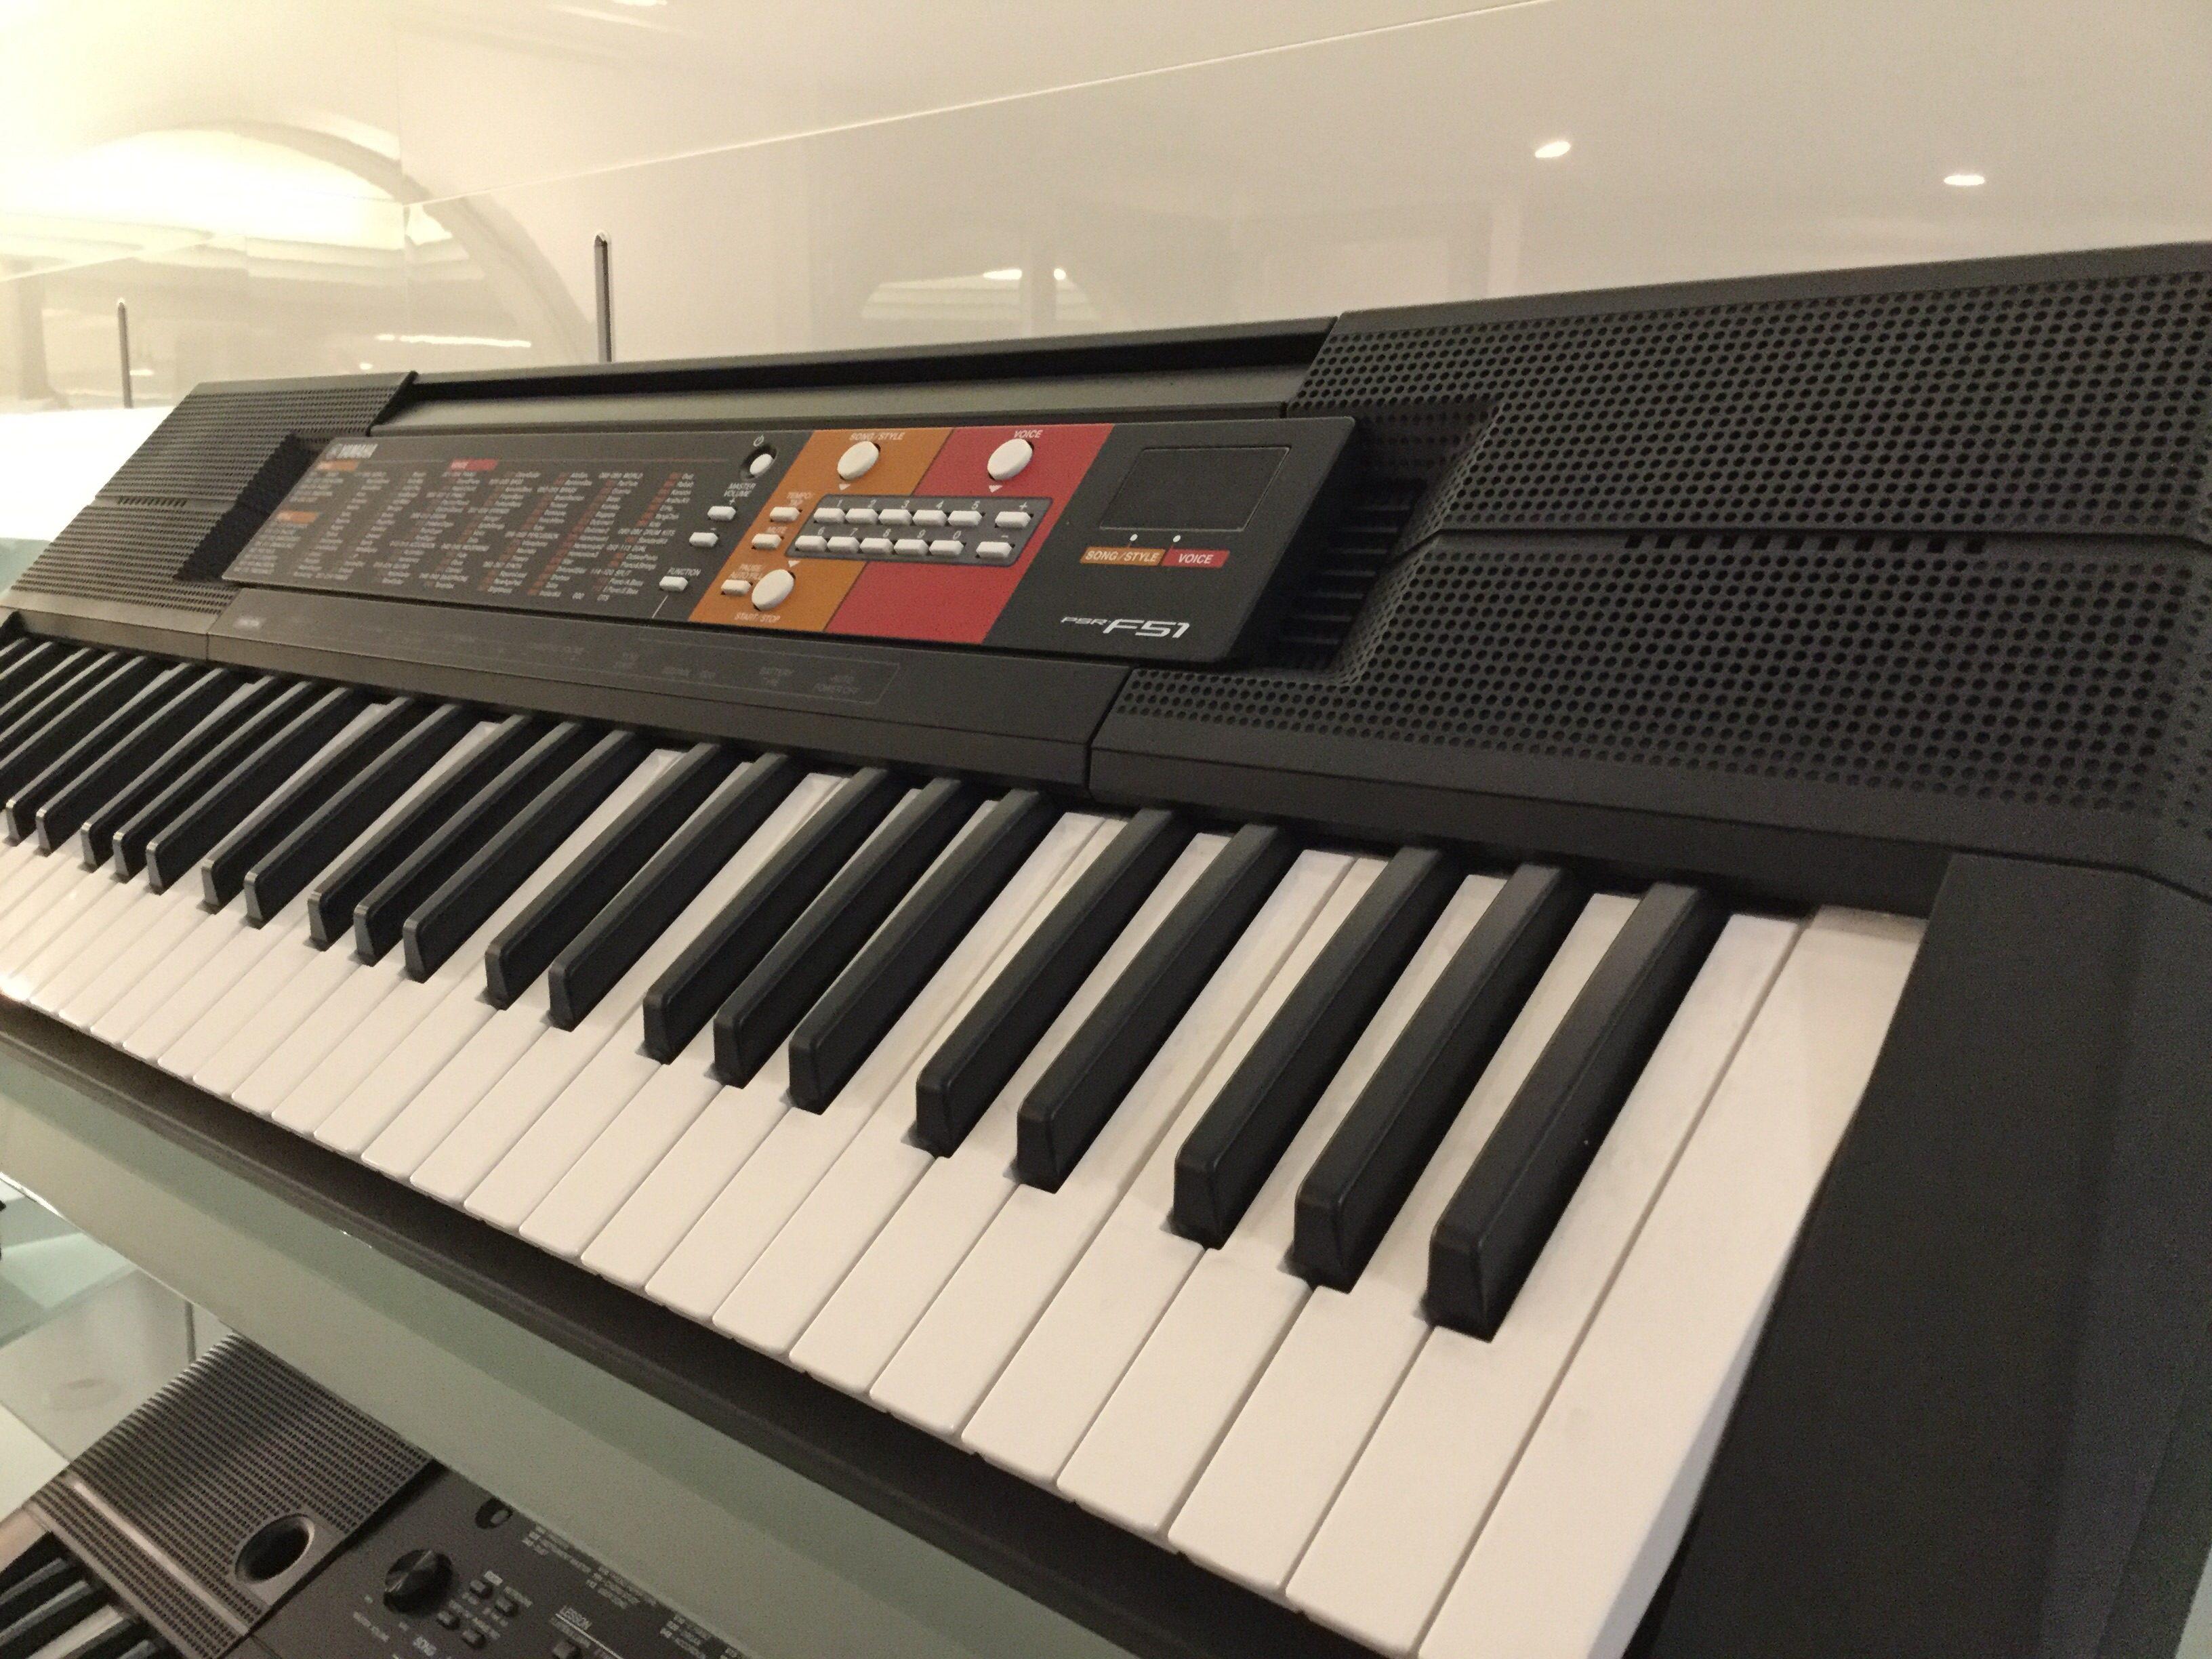 yamaha psr f51 bettin pianoforti strumenti musicali. Black Bedroom Furniture Sets. Home Design Ideas